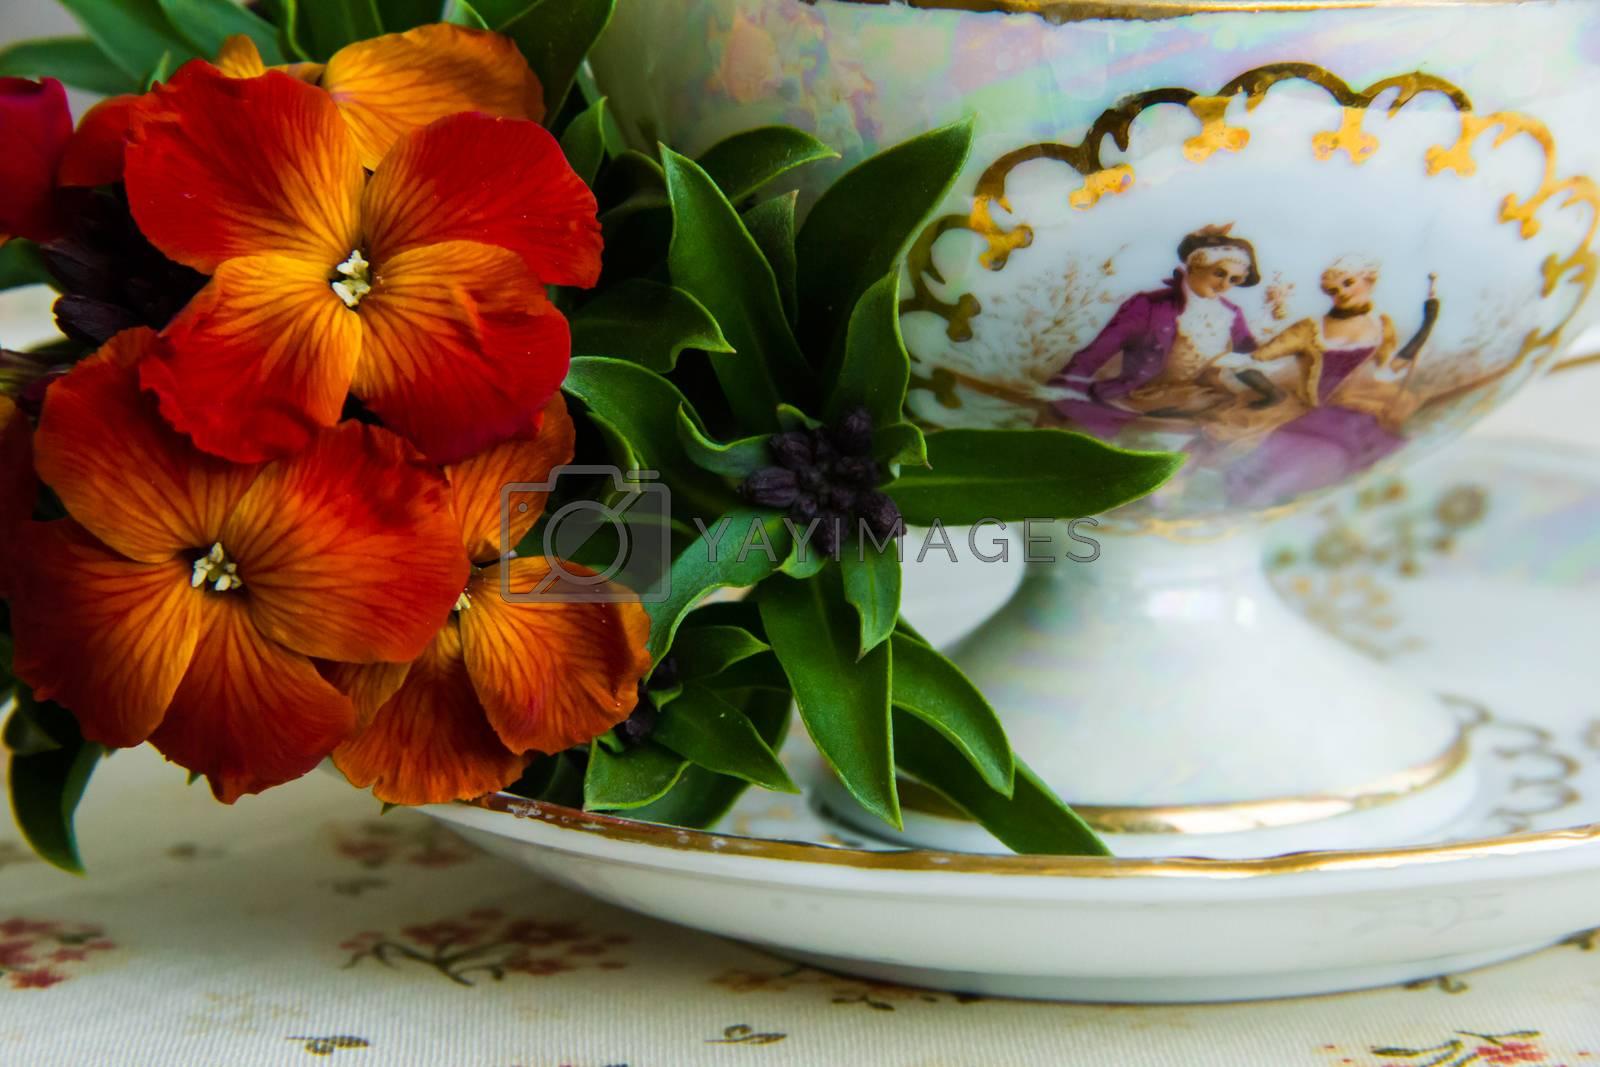 Royalty free image of background by Irinavk